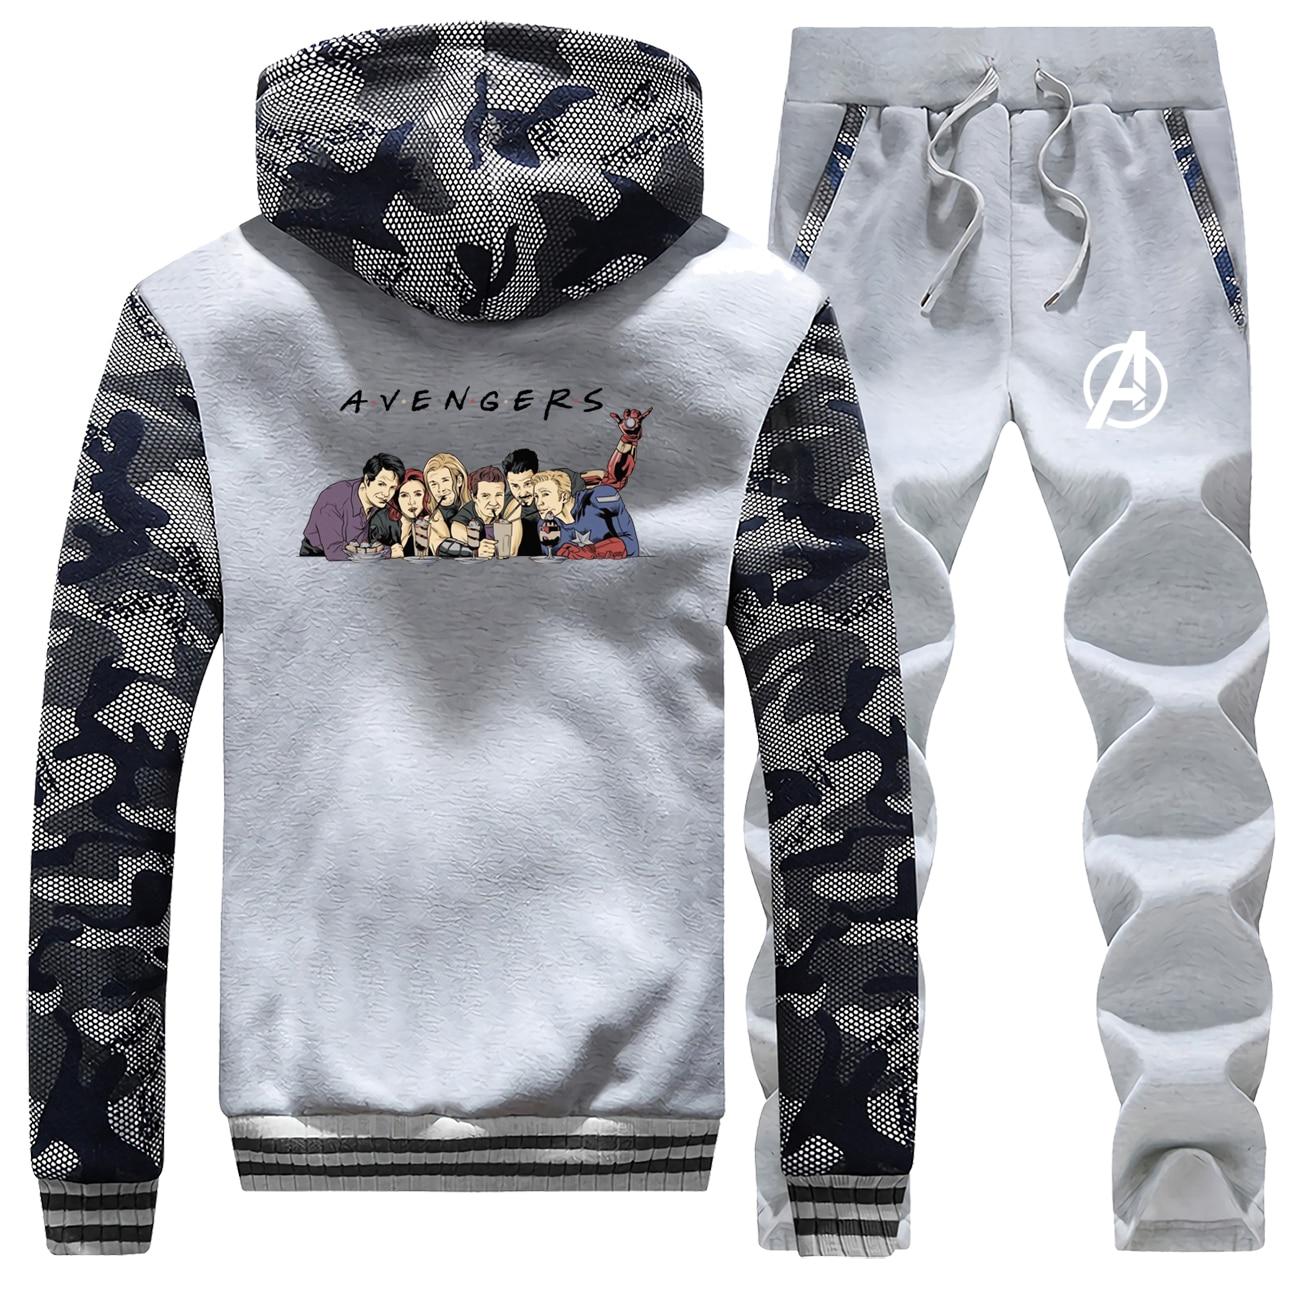 AVENGERS Male Clothing Suit Winter Thick Sports Jacket Brand Warm Pants Men Hip Hip Biker 2 Piece Set Casual Harajuku Tracksuit